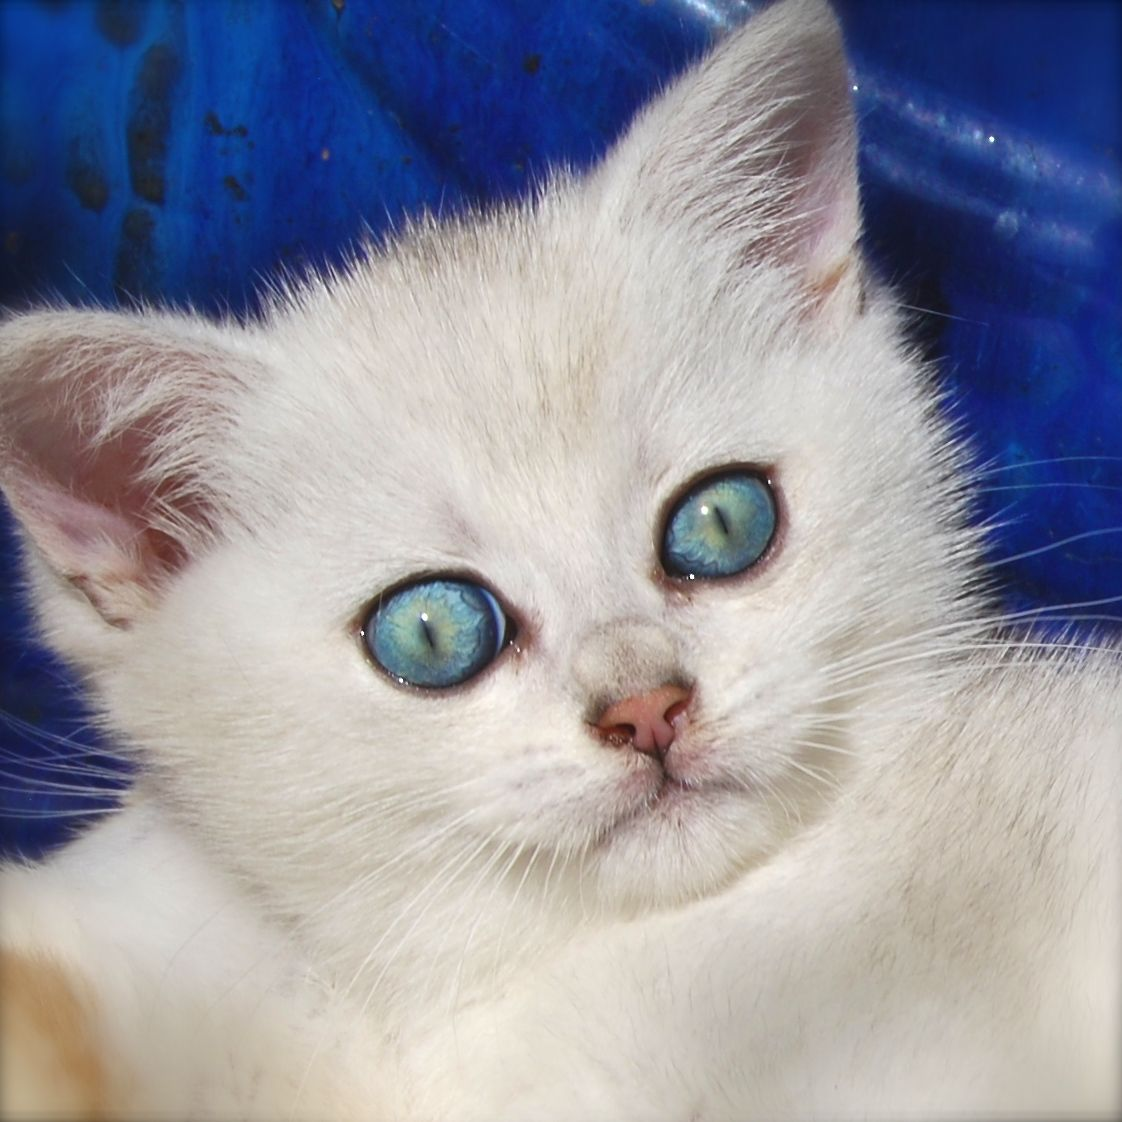 Belle Ayr Silver Wonder Silver Shaded Boy British Shorthair Cats Ayr Cattery